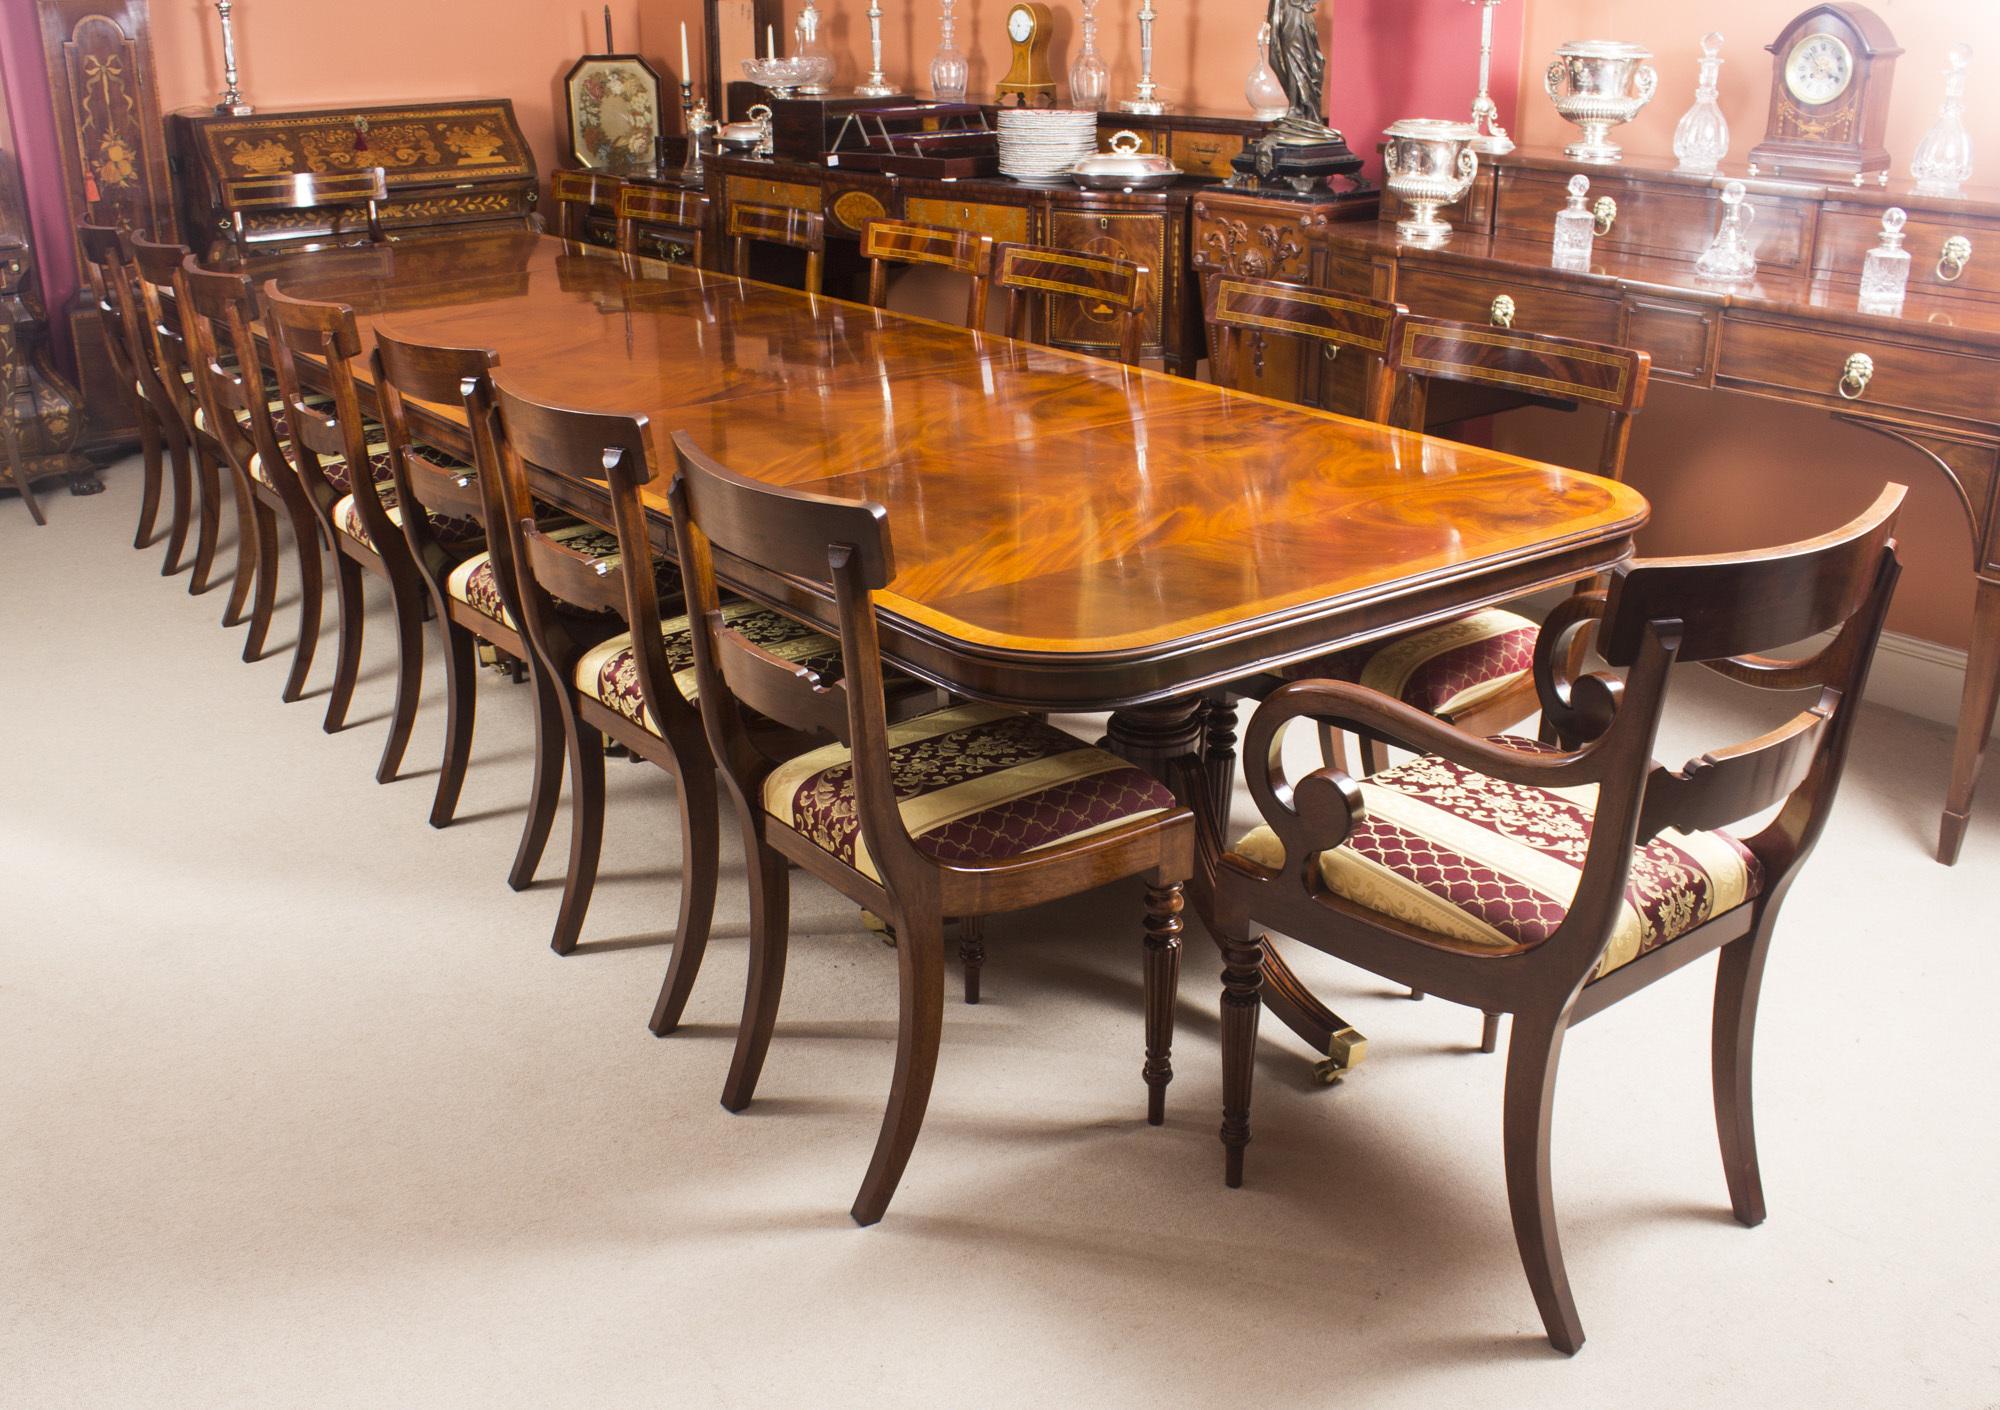 Bespoke 14 Ft Three Pillar Mahogany Dining Table And 16 Chairs Vinterior